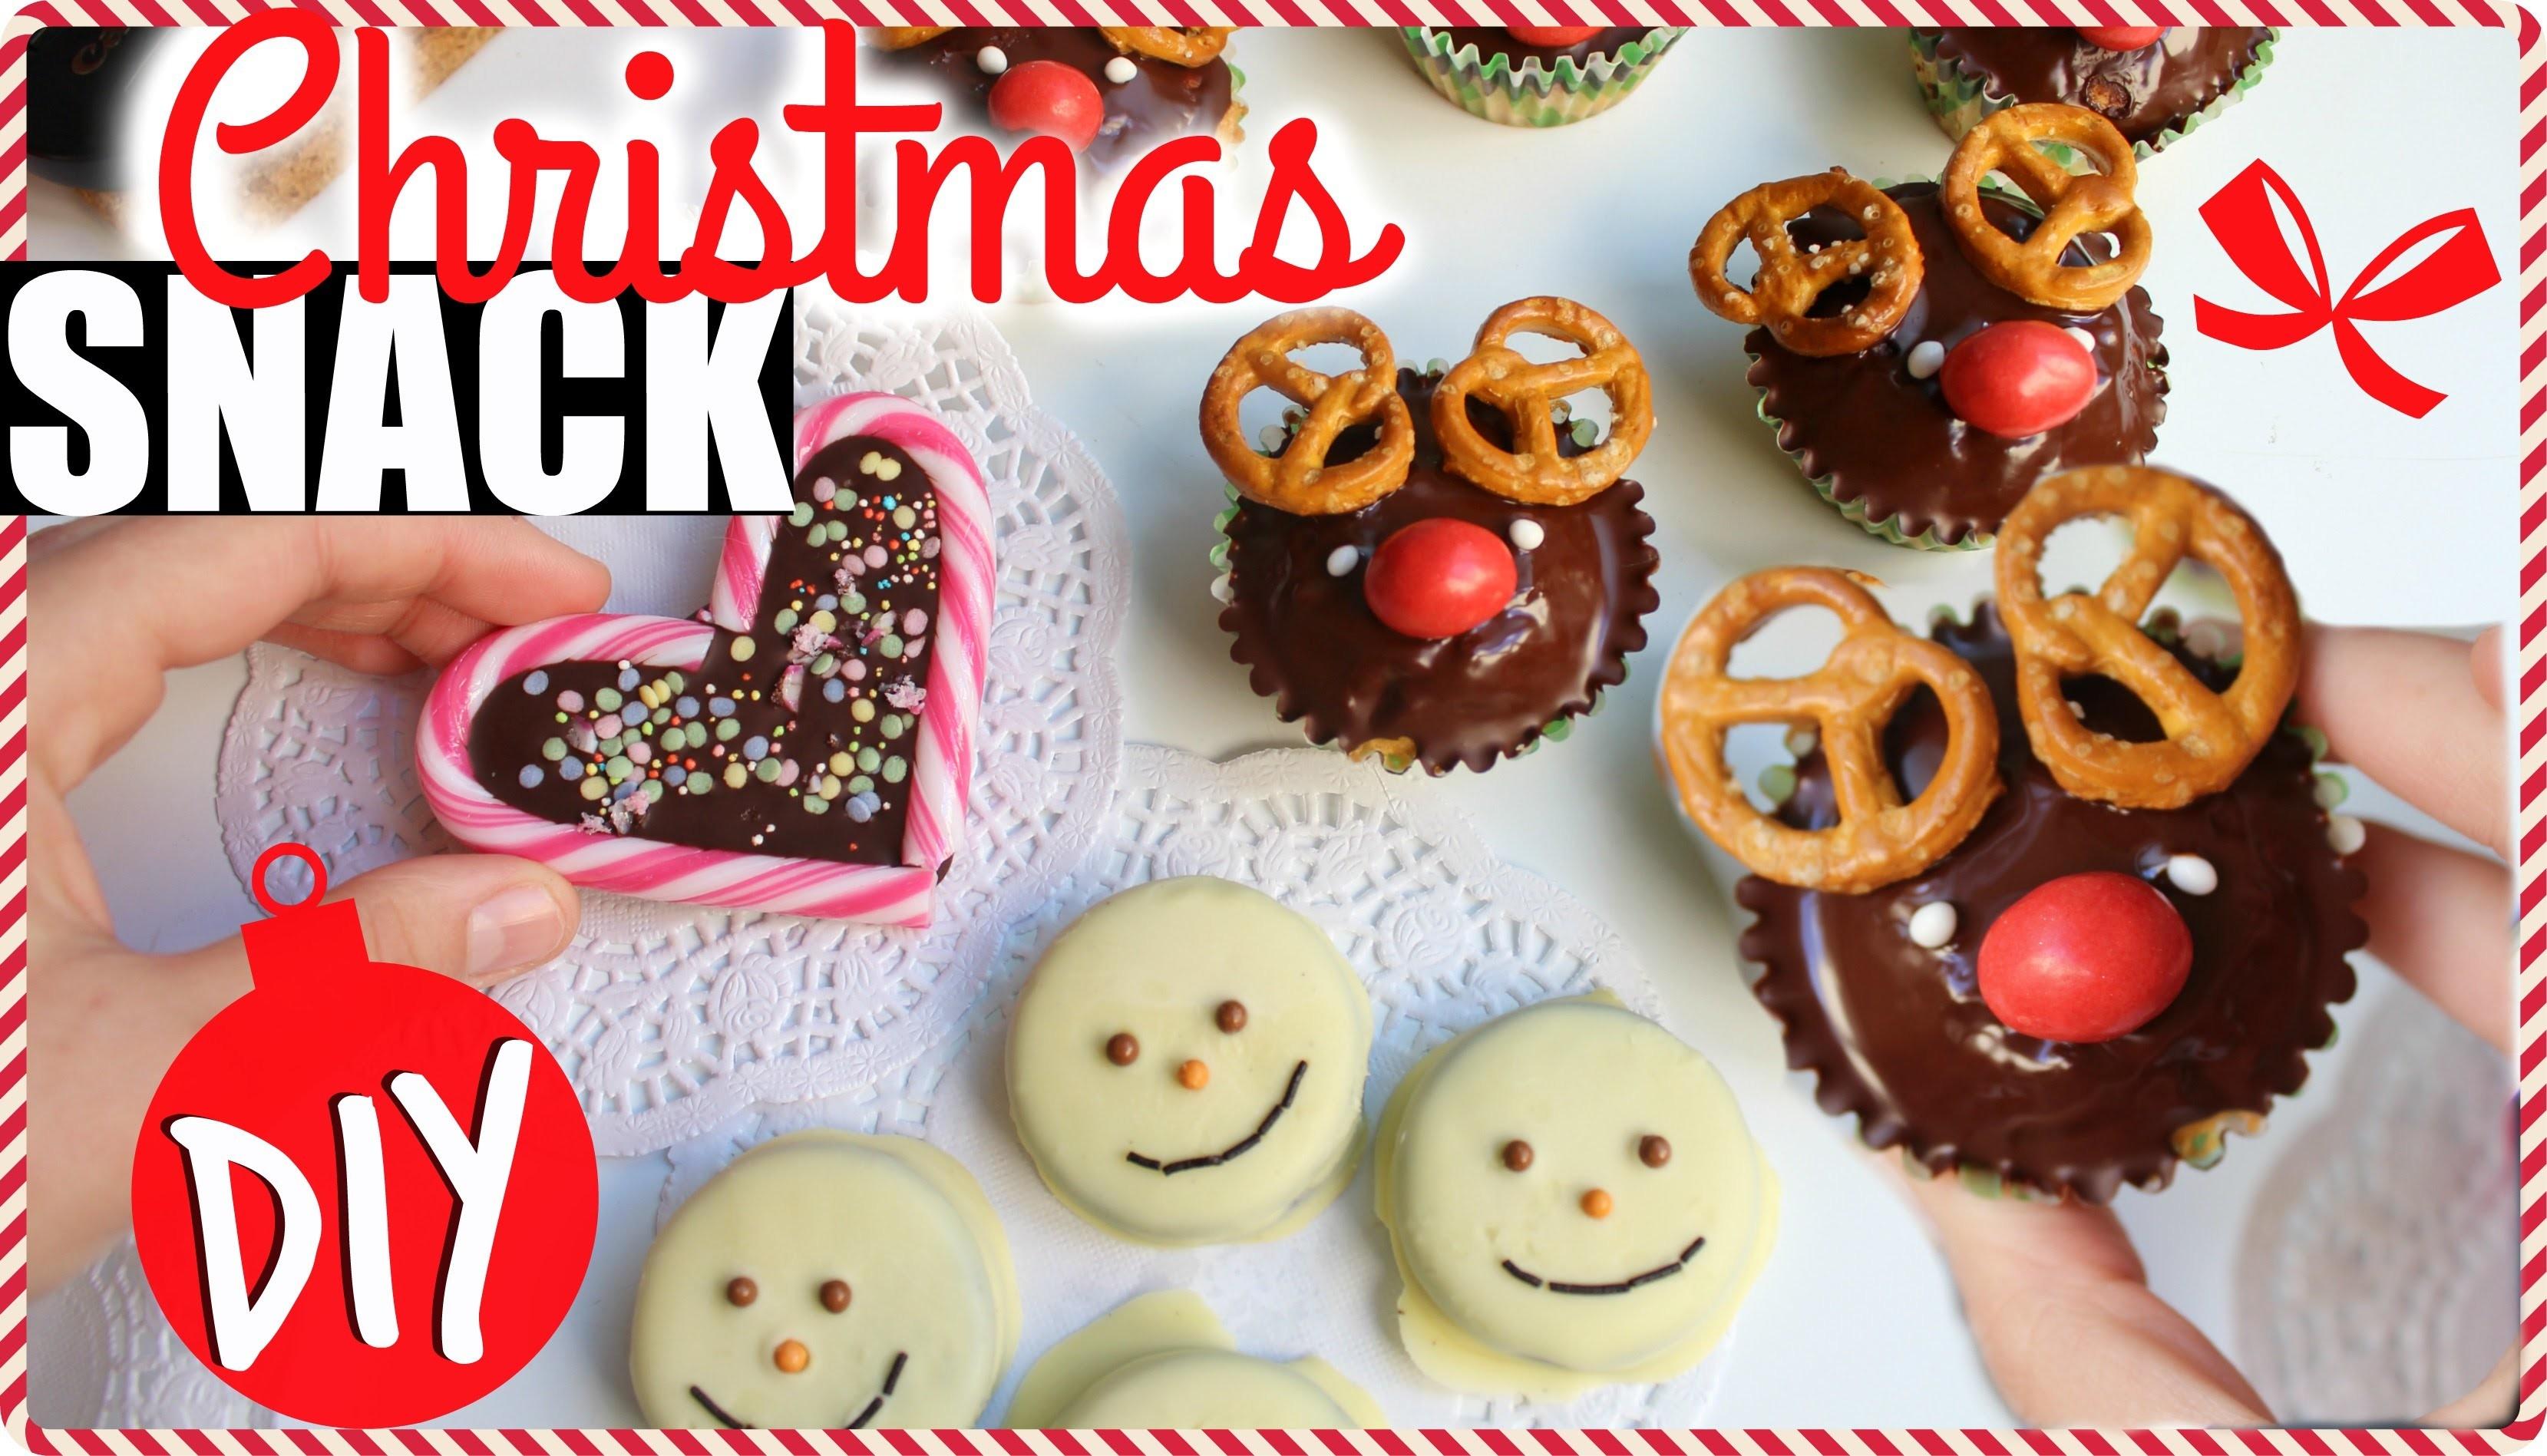 LAST MINUTE Christmas Snack! Facili e Veloci! ♥ #InCucinaConNè